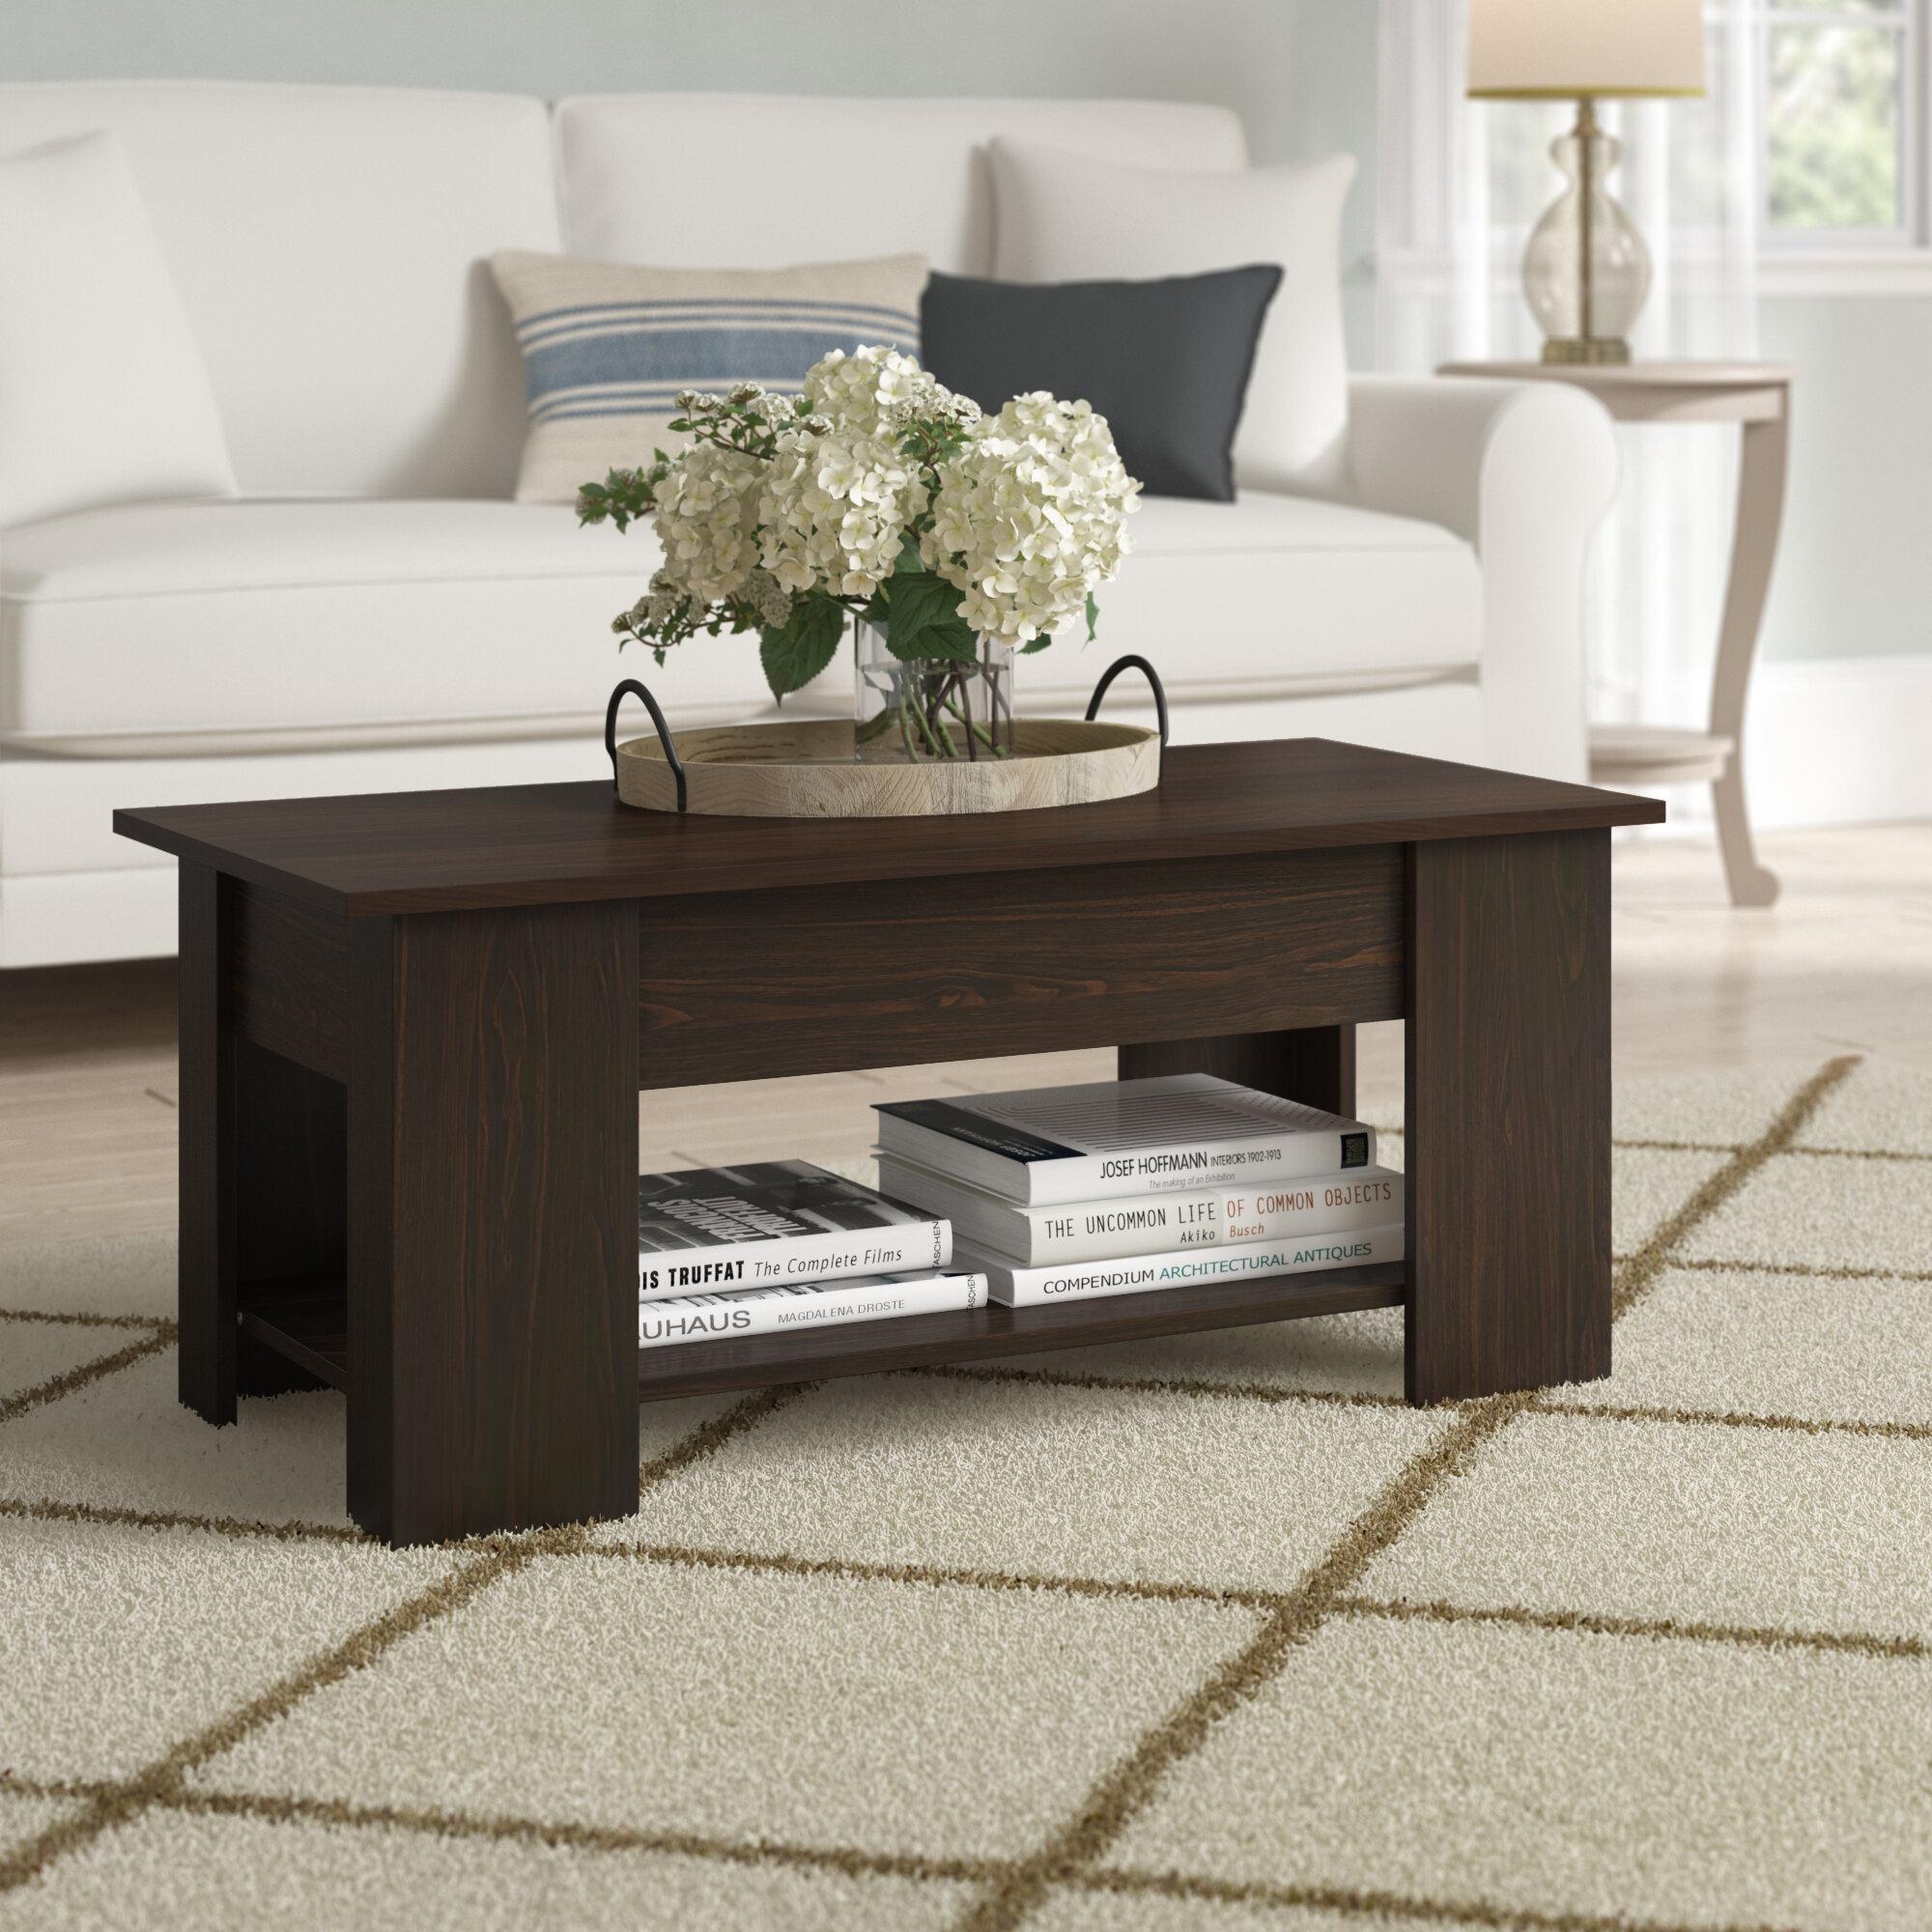 Ebern Designs Maier Lift Top Coffee Table Reviews Wayfair [ 2000 x 2000 Pixel ]